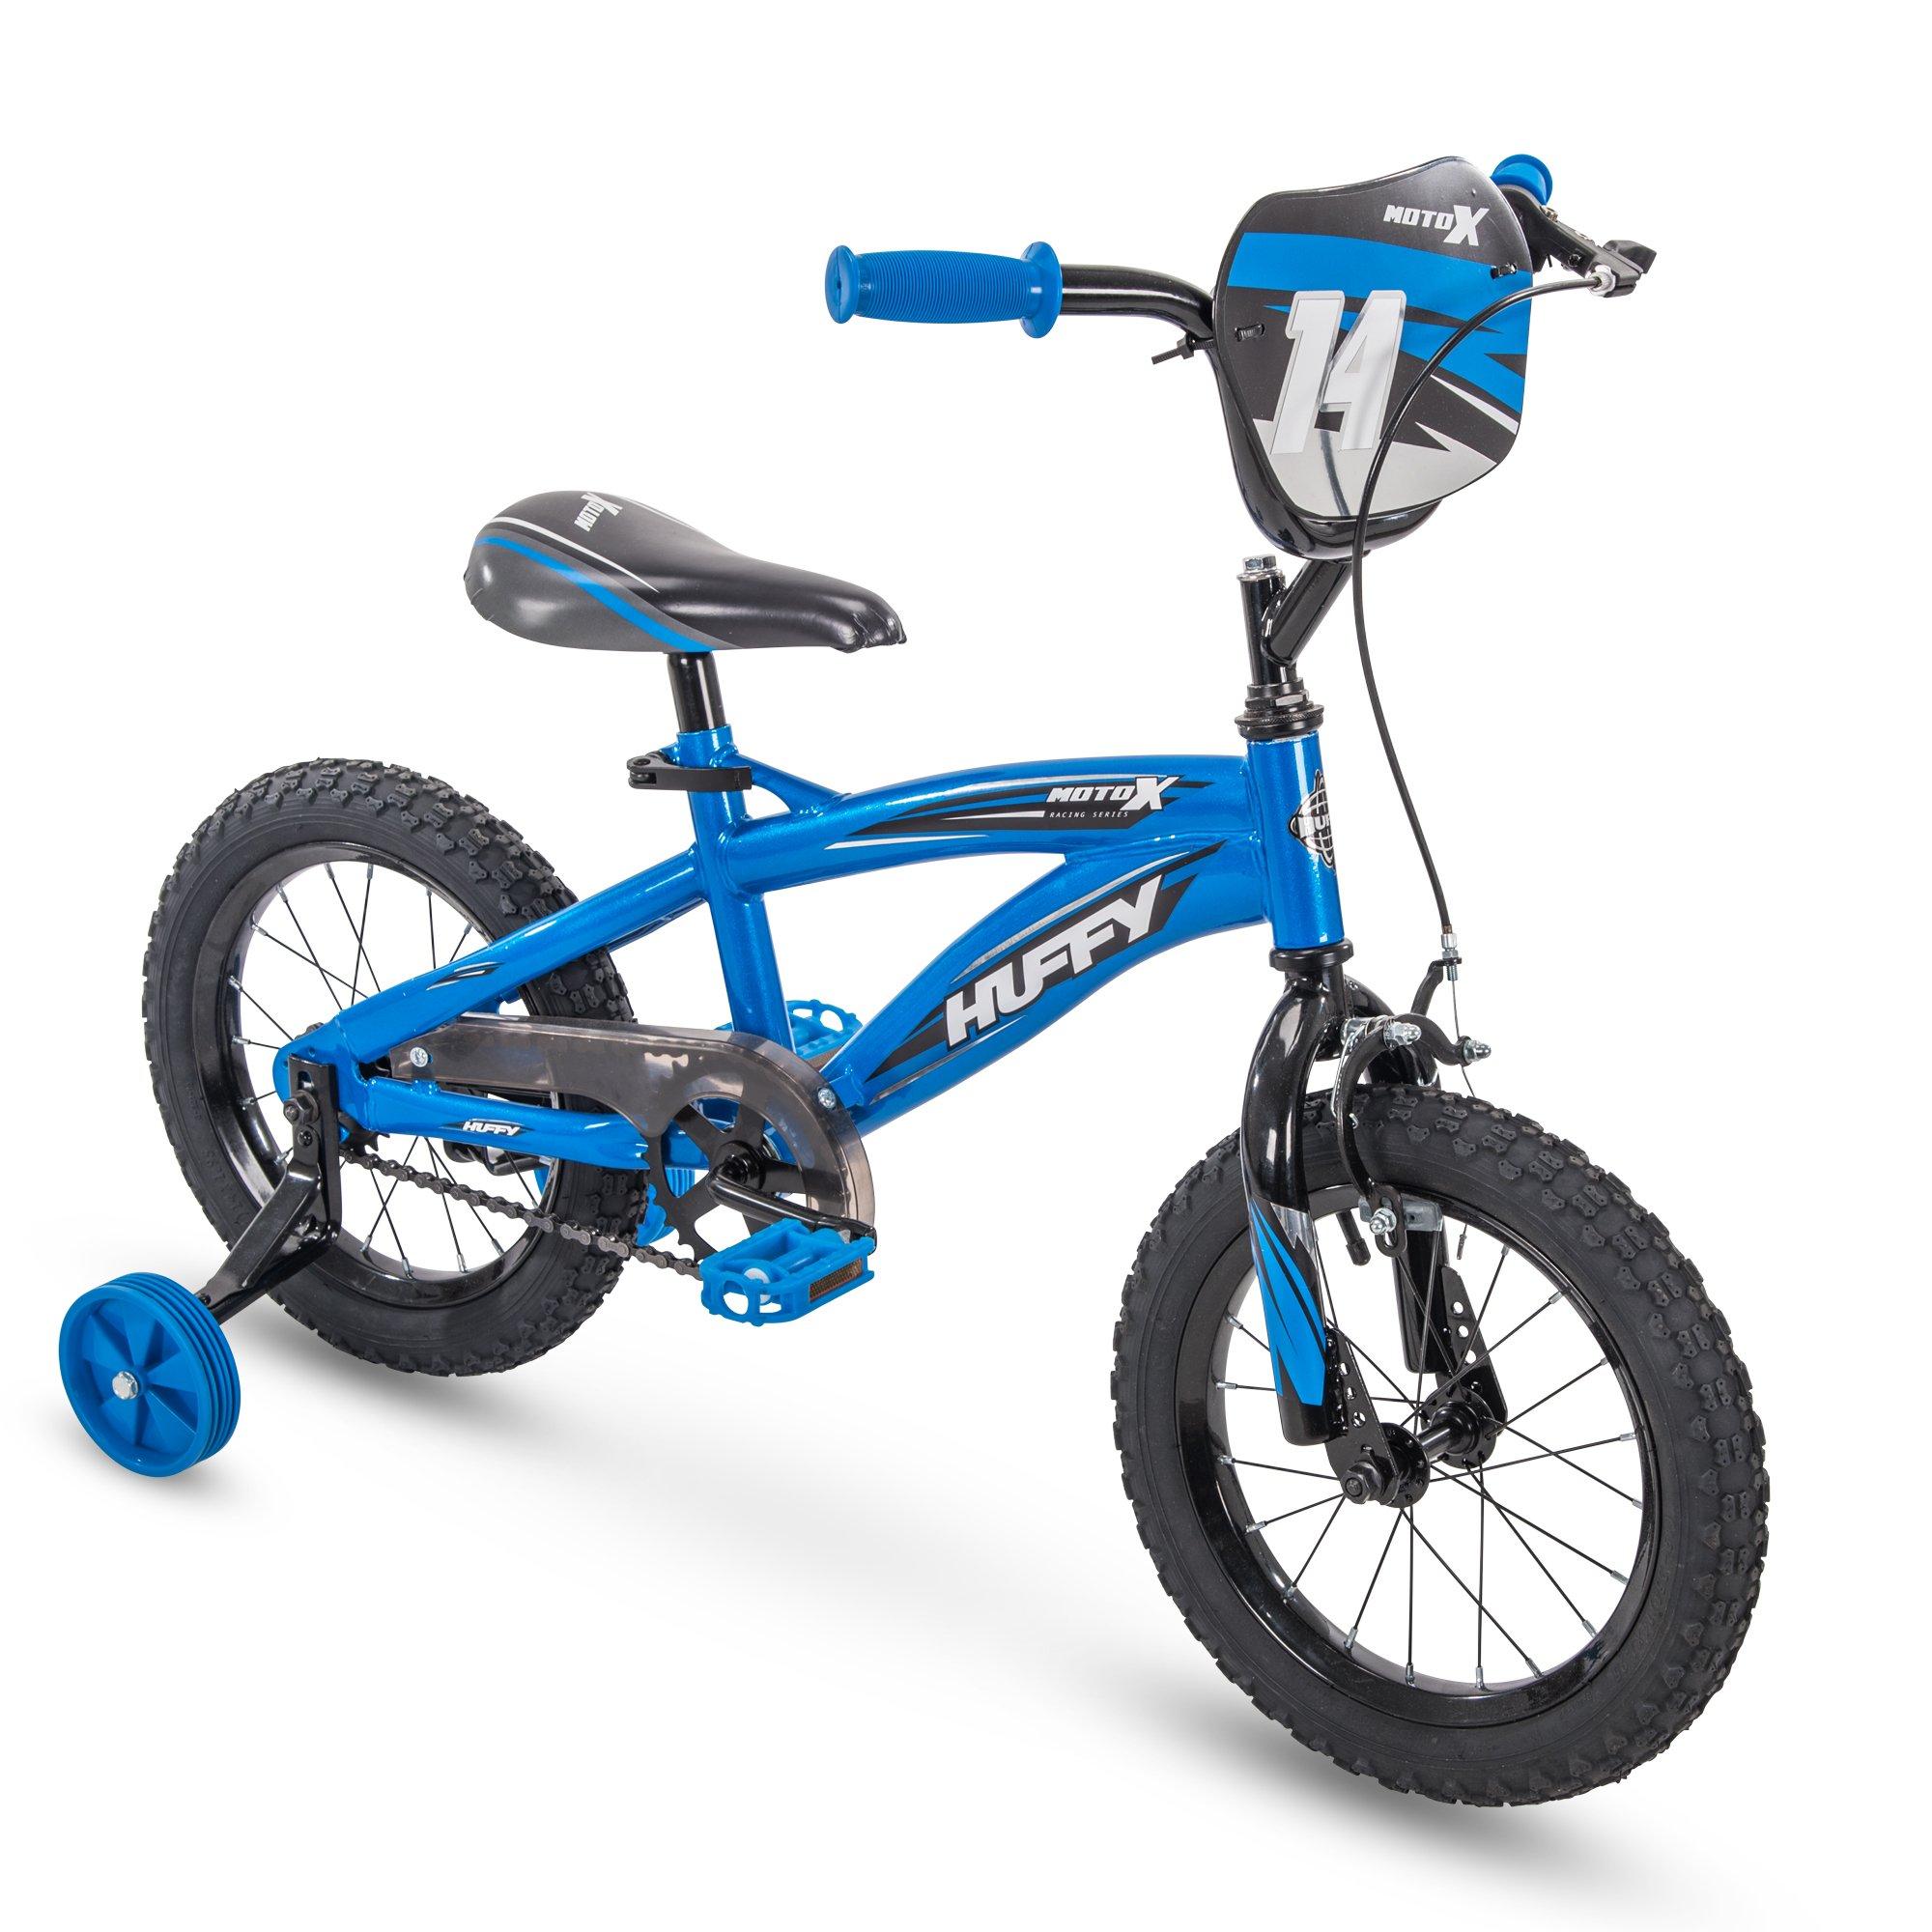 Huffy Moto X Boys Bike Training Wheels & 12'', 14'', 16'', 18'' Wheel Sizes